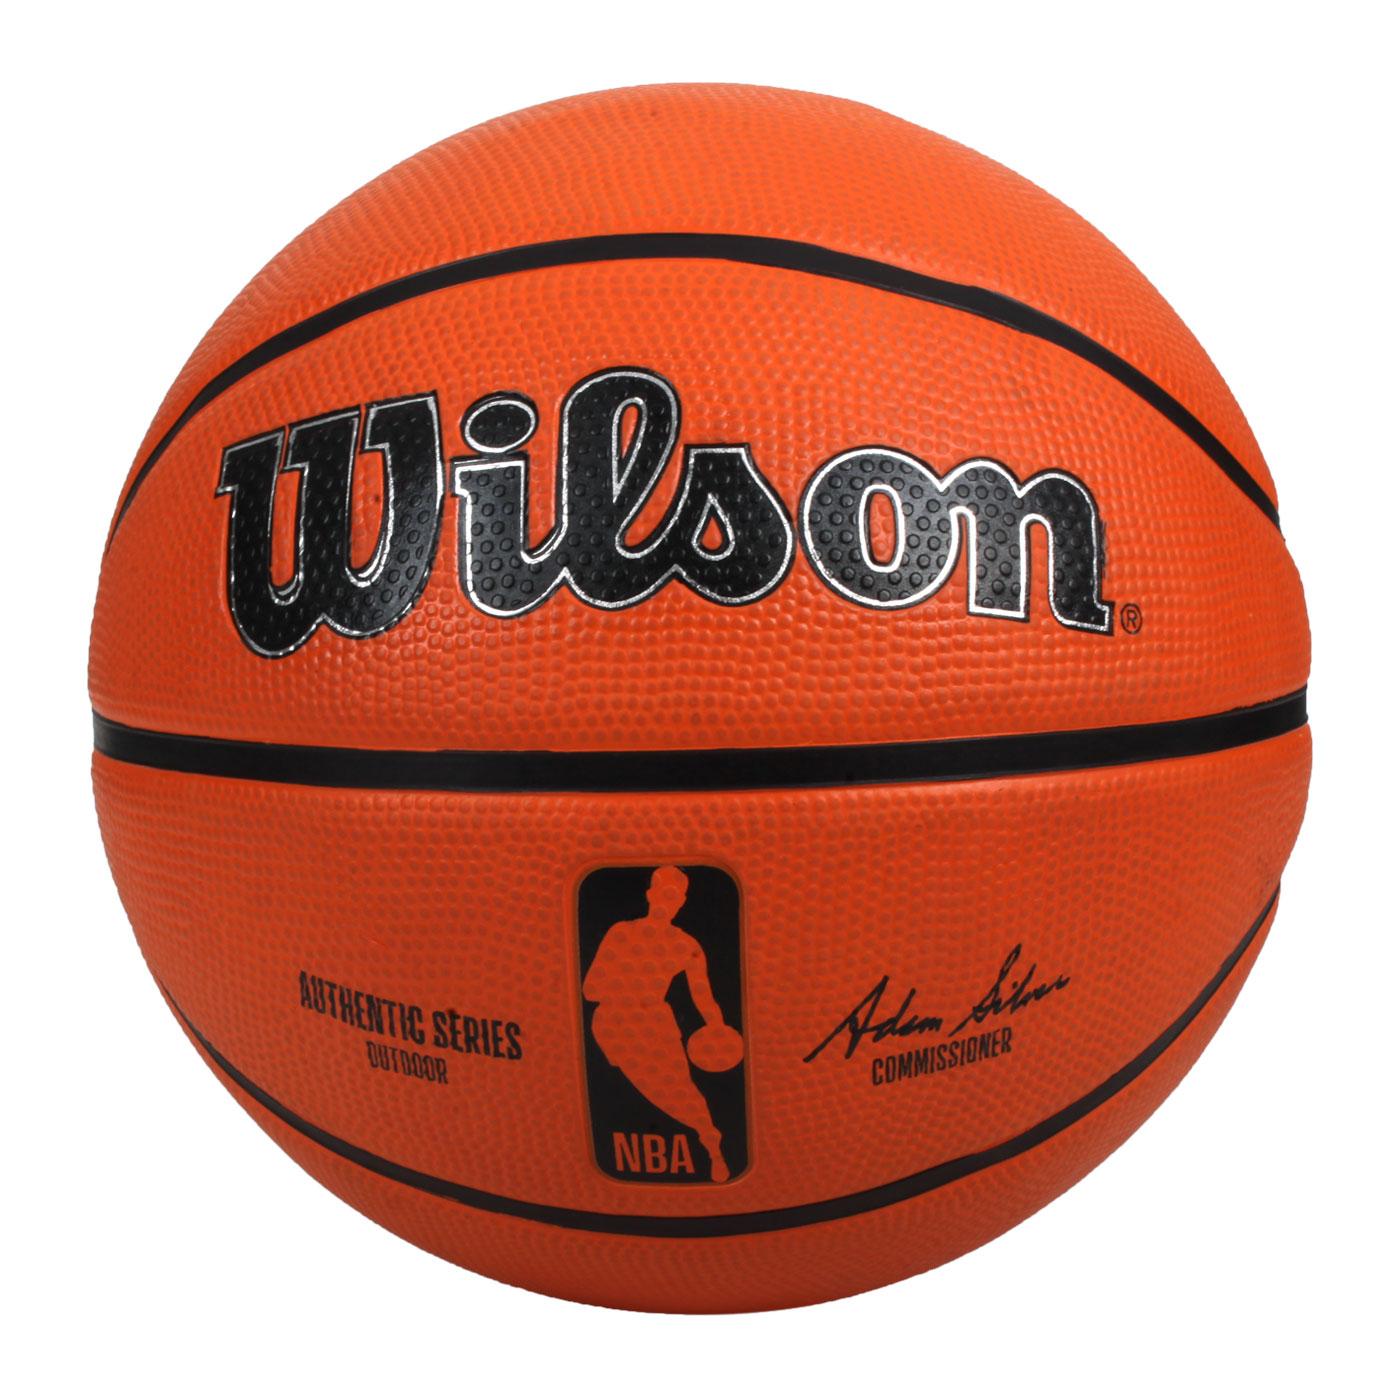 WILSON NBA AUTH系列室外橡膠籃球#7 WTB7300XB07